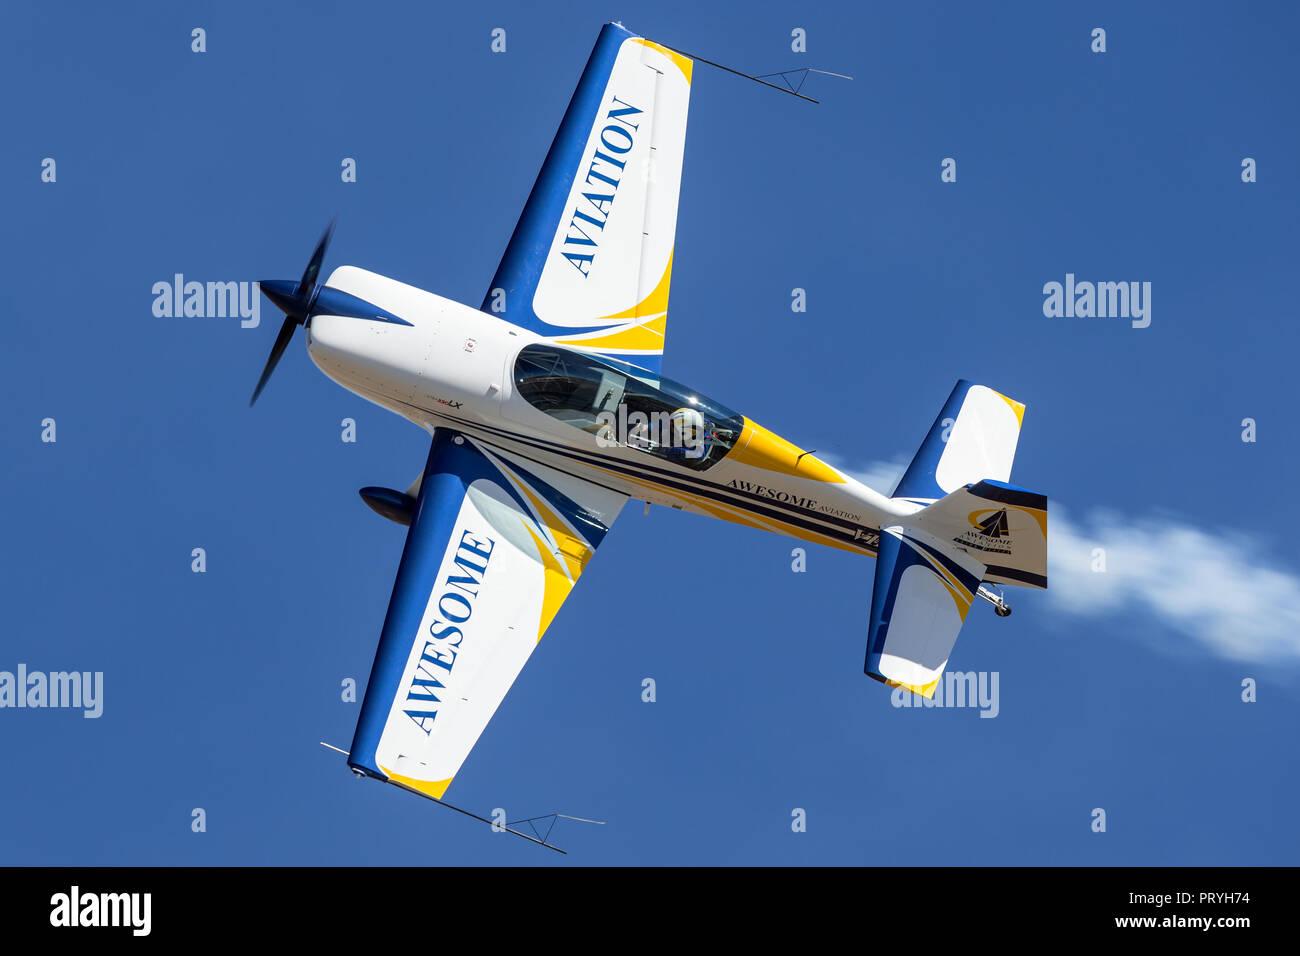 British aerobatic pilot Mark Jefferies flying a single